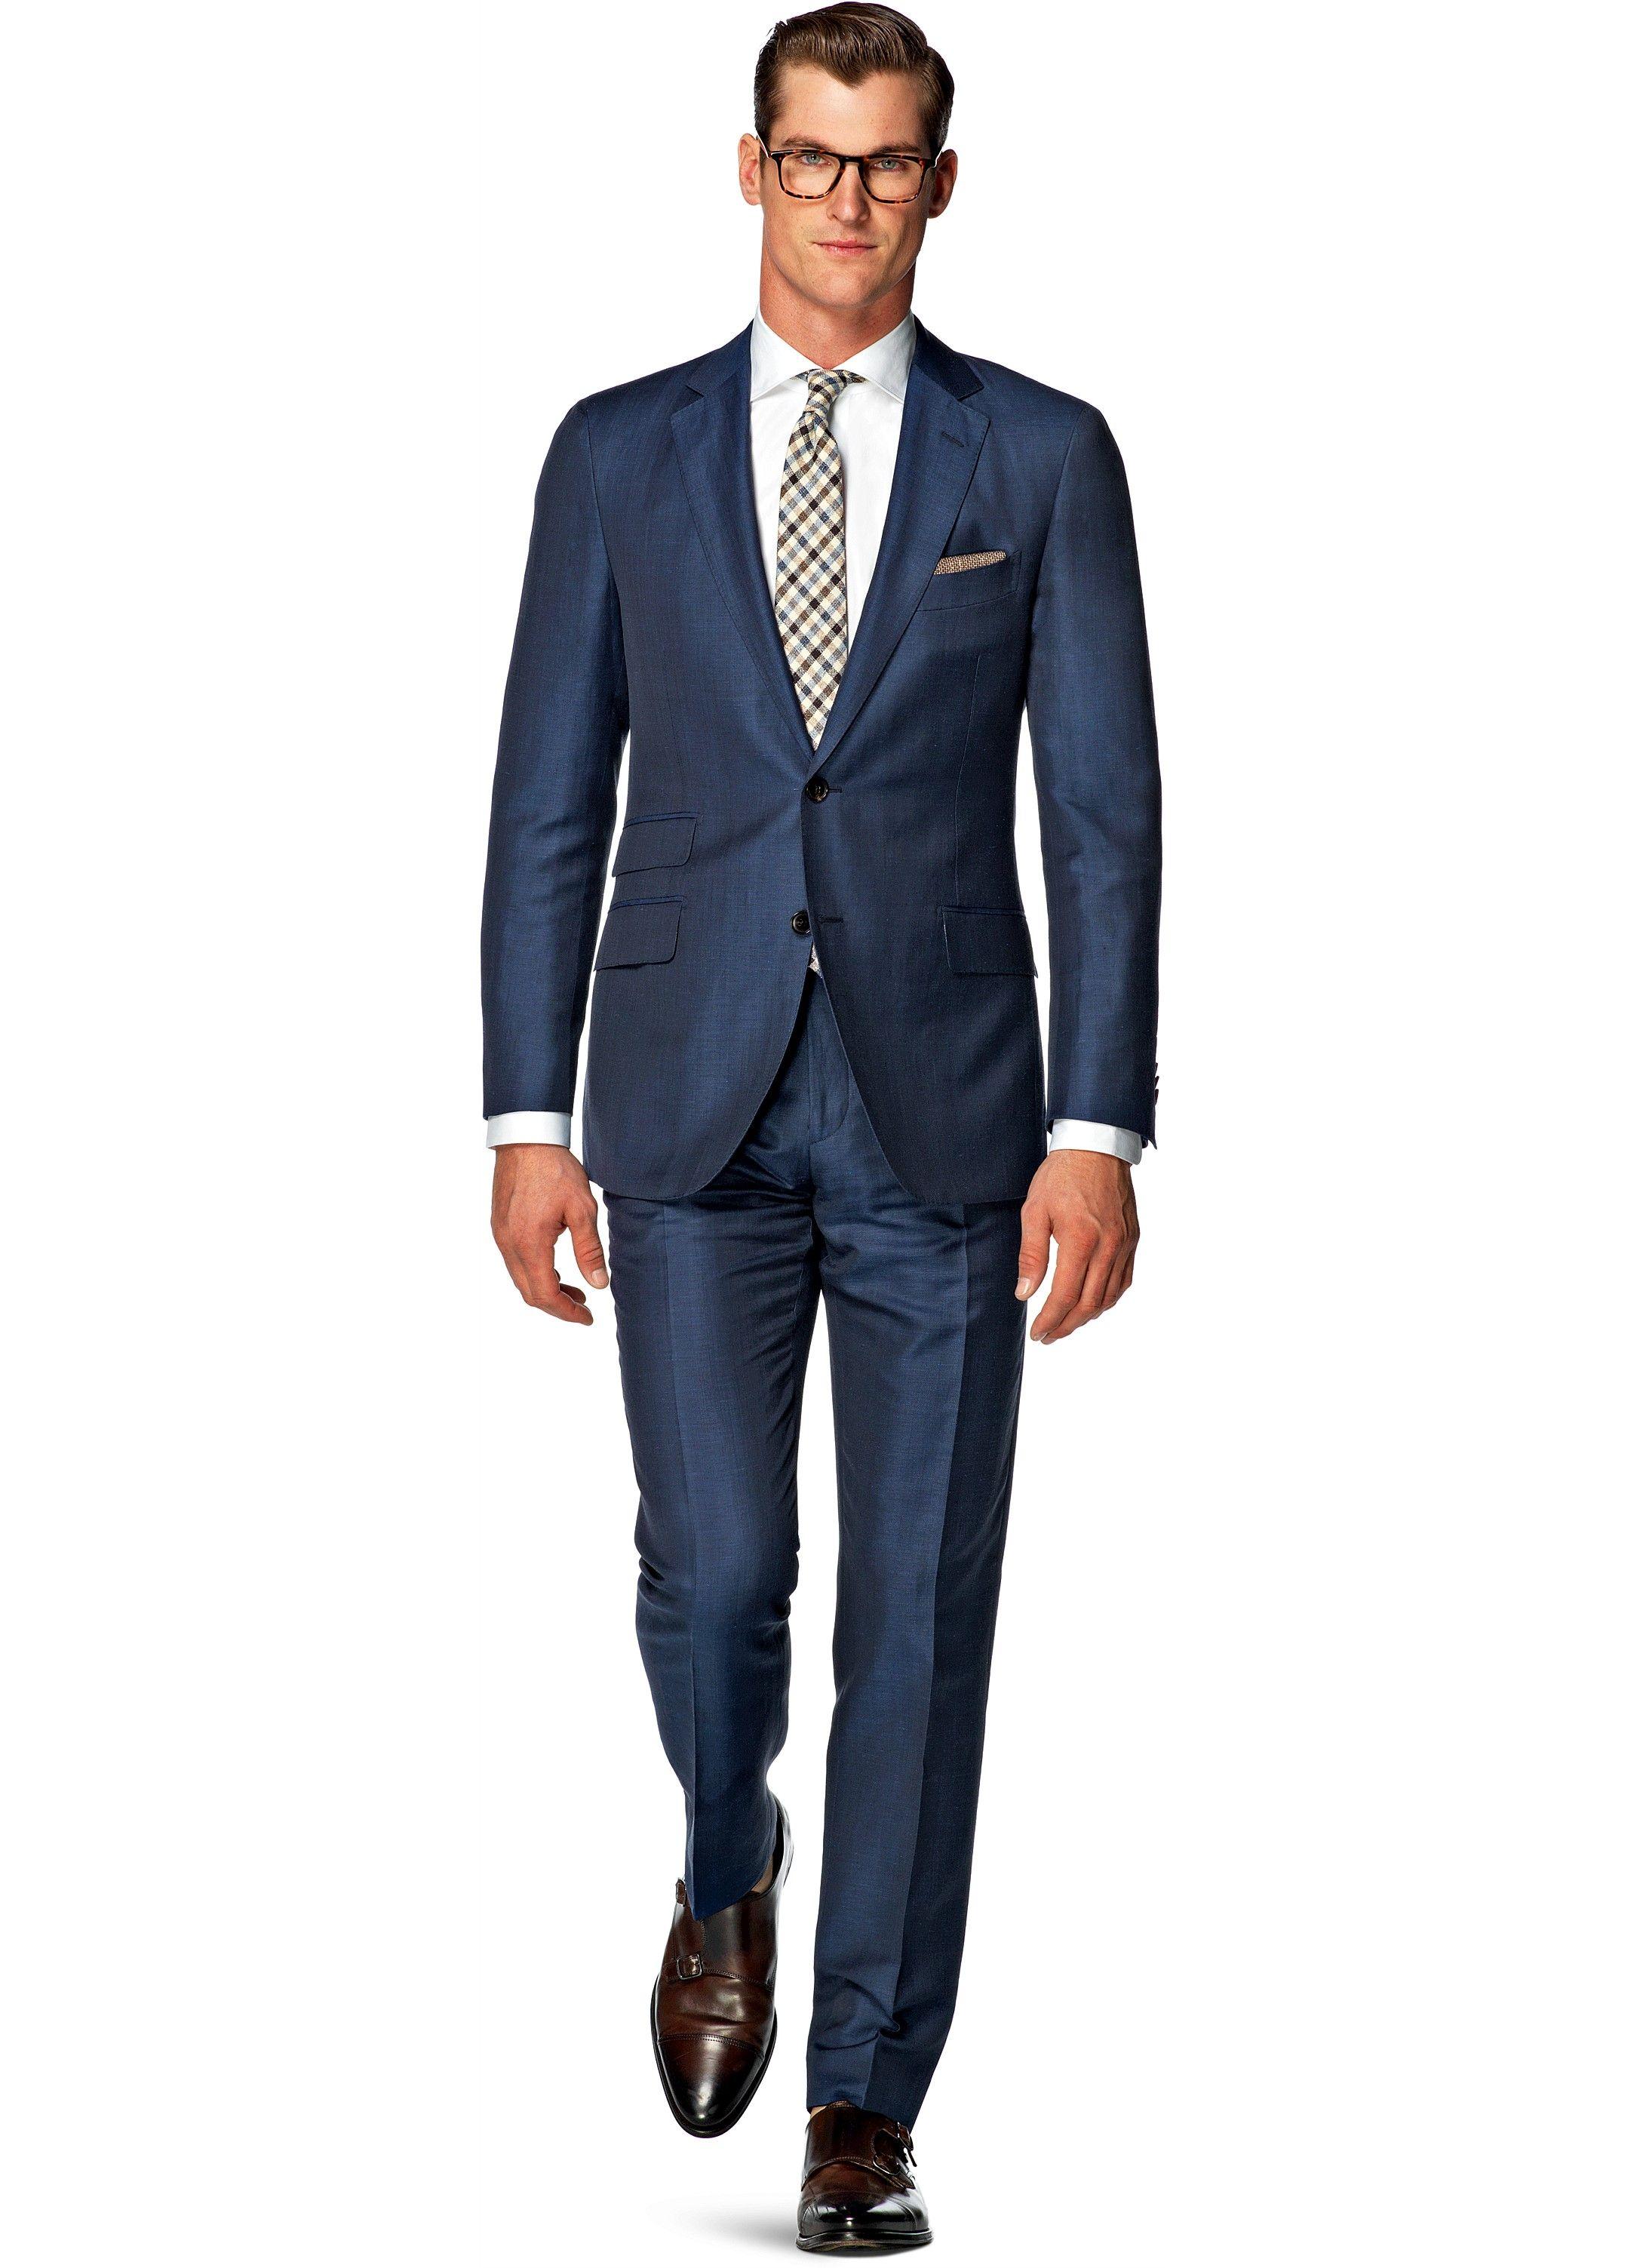 Suit Blue Plain Sienna P3882i | Suitsupply Online Store